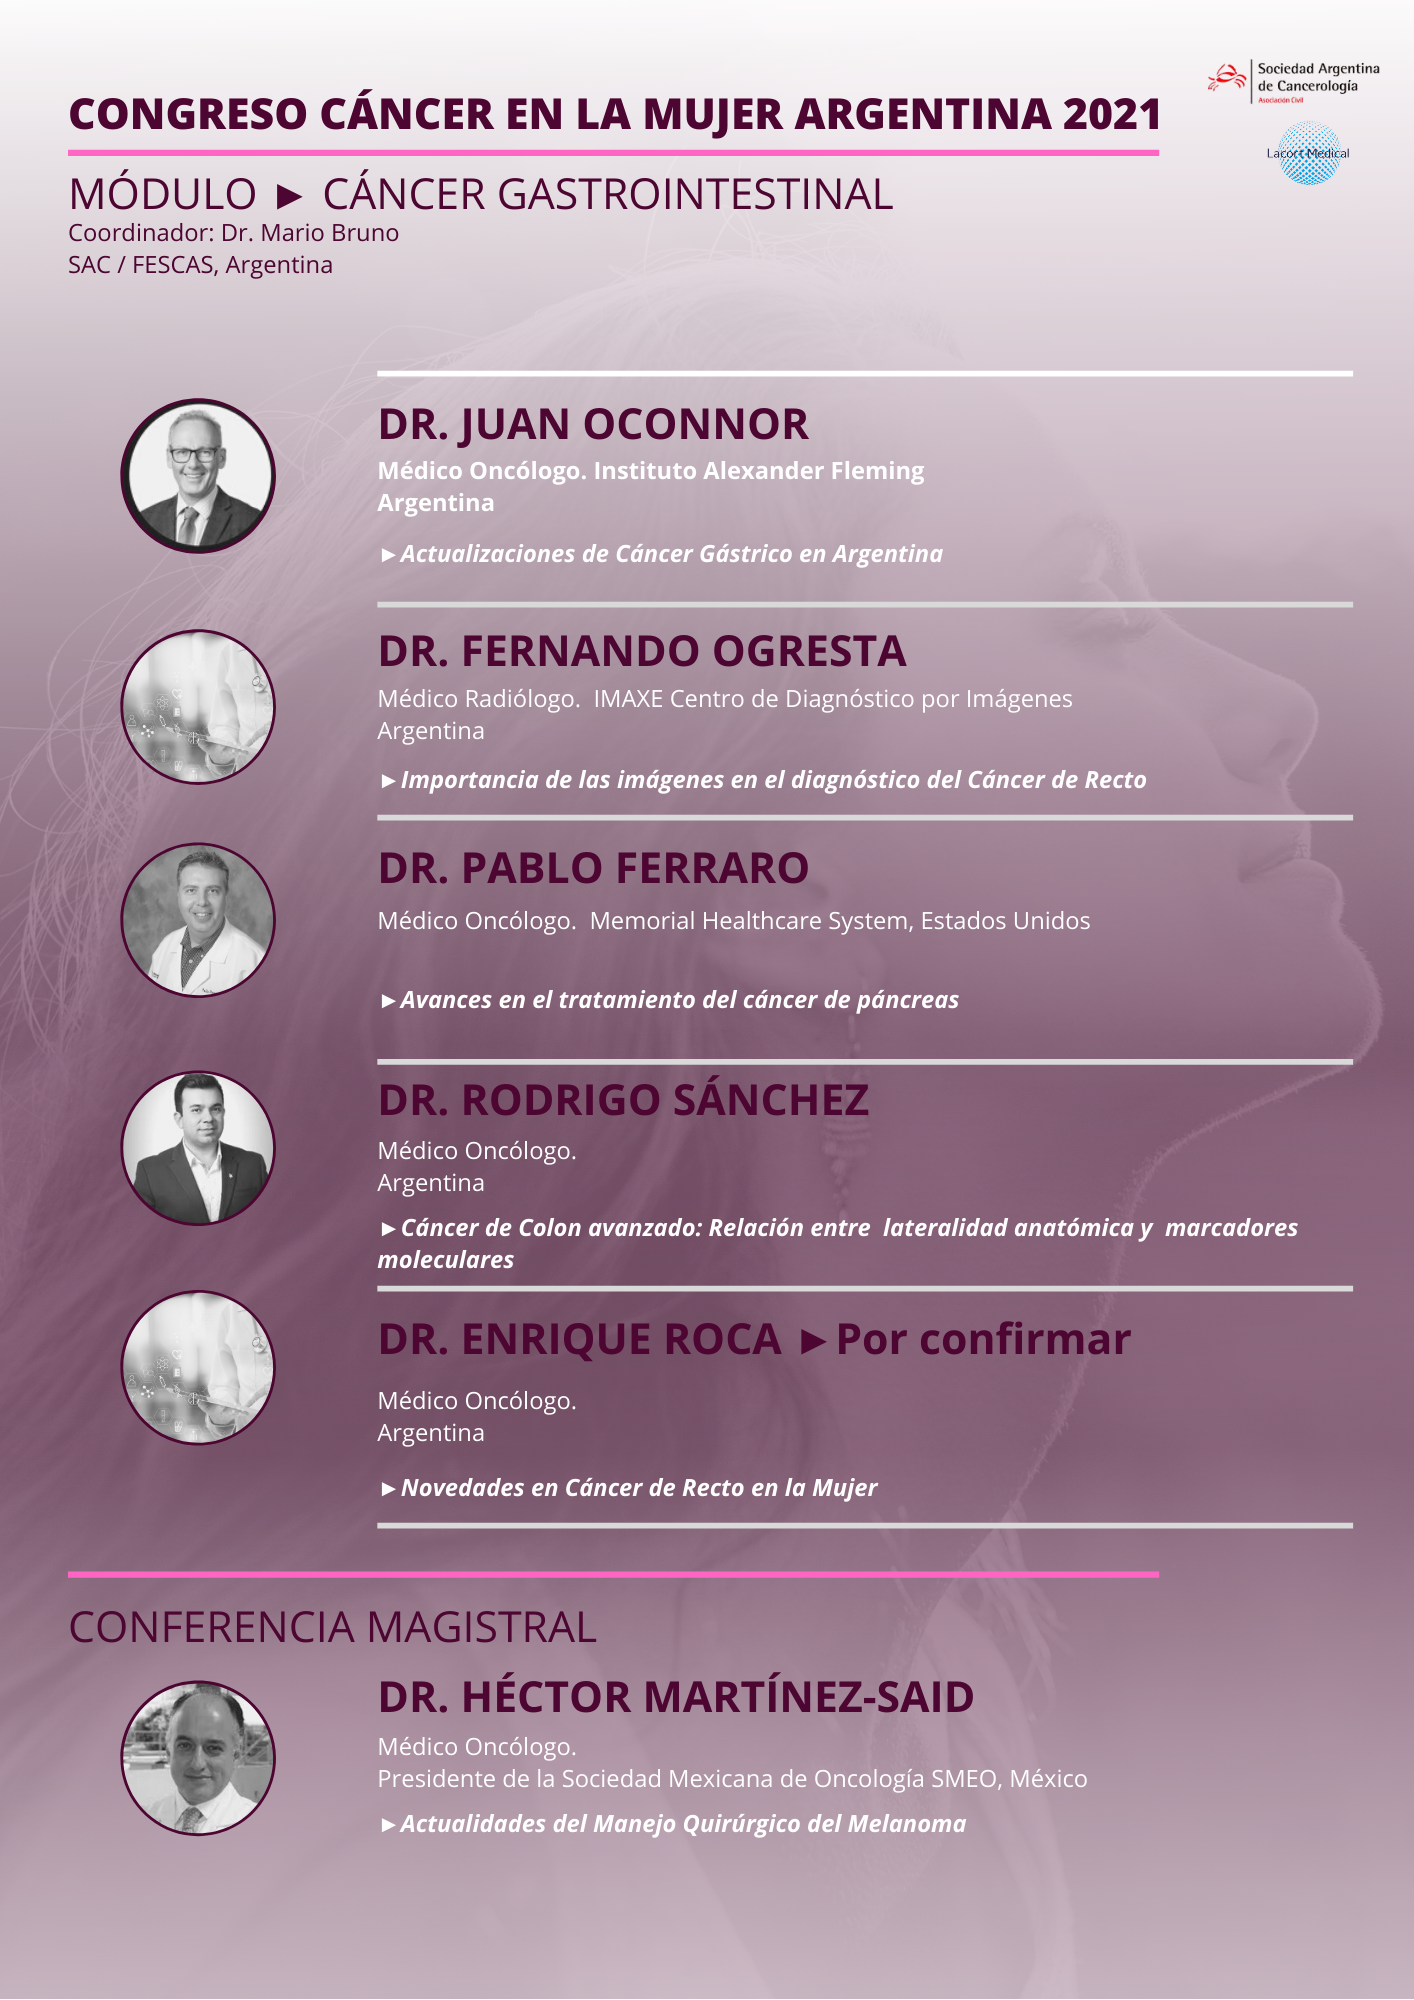 AGENDA ACADEMICA ARGENTINA 2021 (10).png